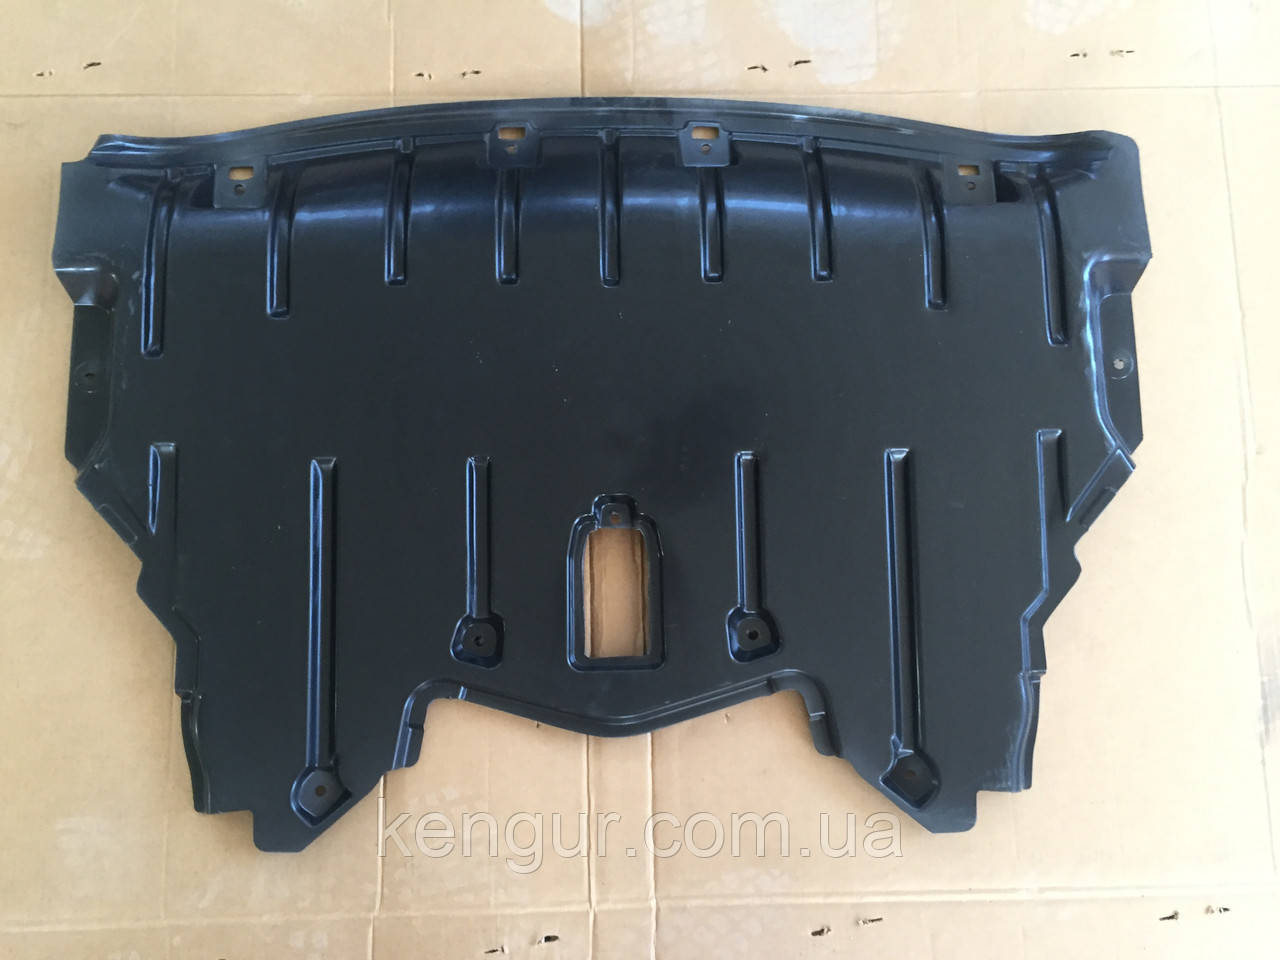 Экран моторного отсека BMW X5 E70 2007-2010 51757158385